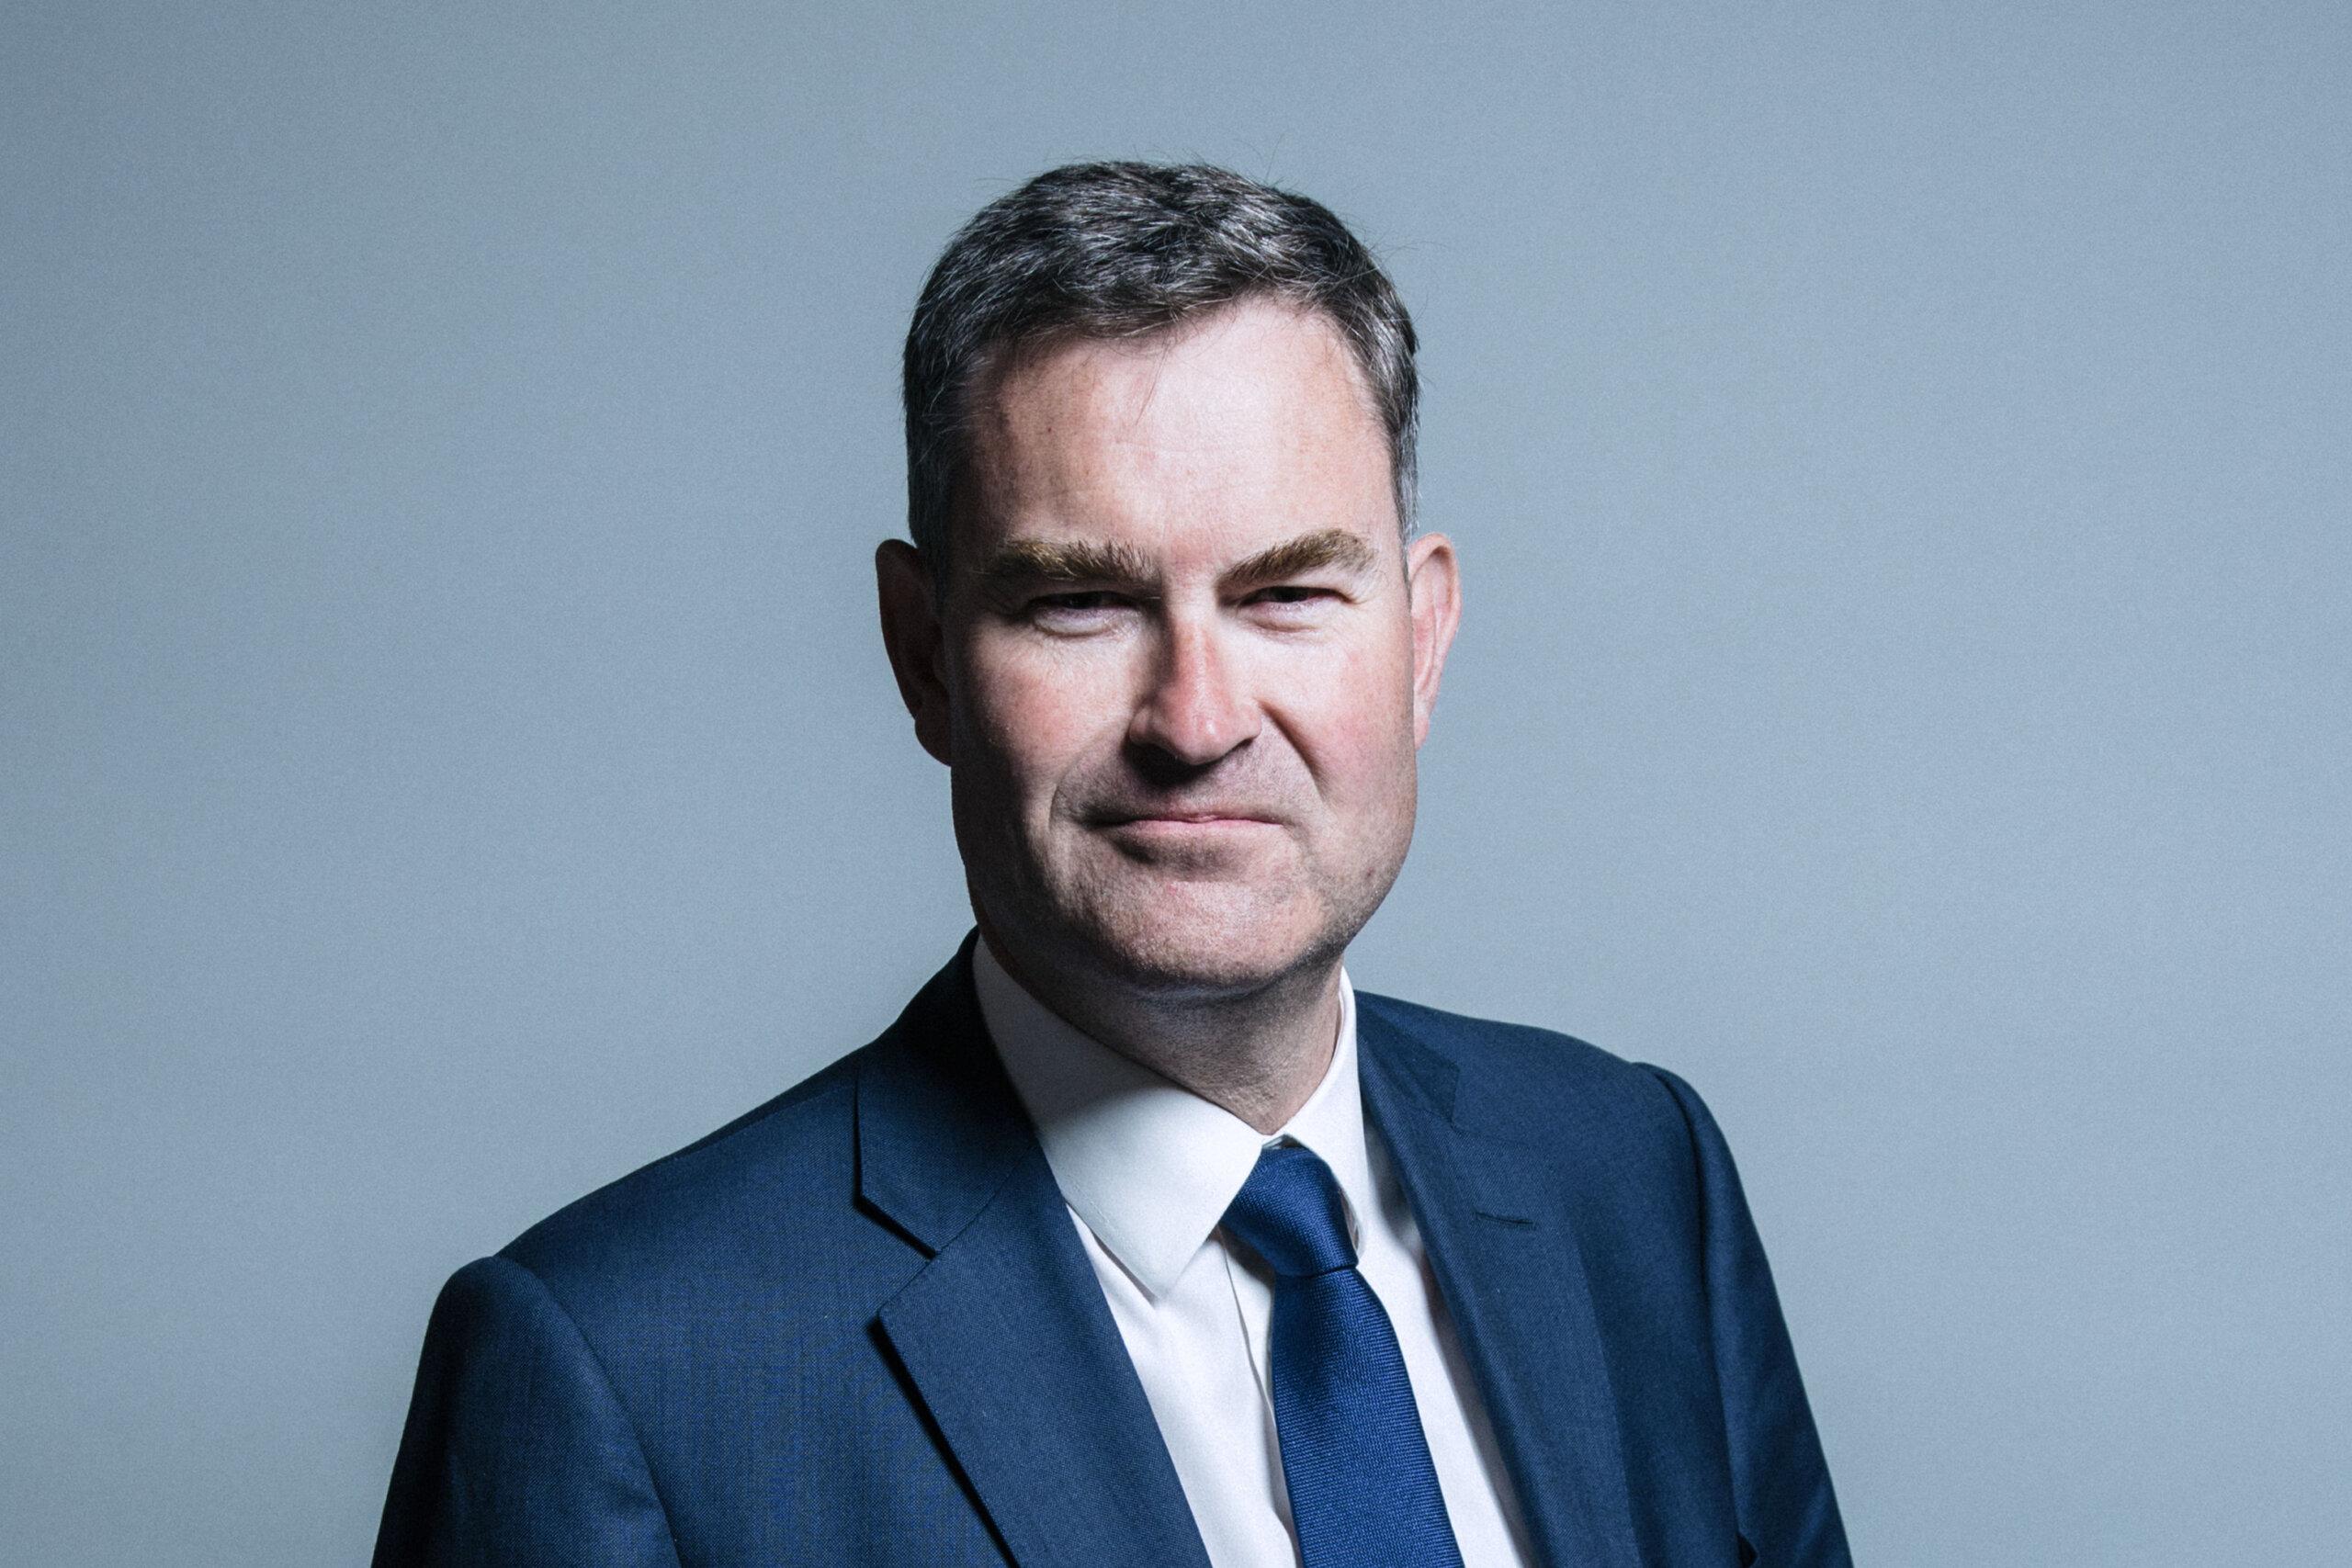 Justice Secretary announces new model for probation